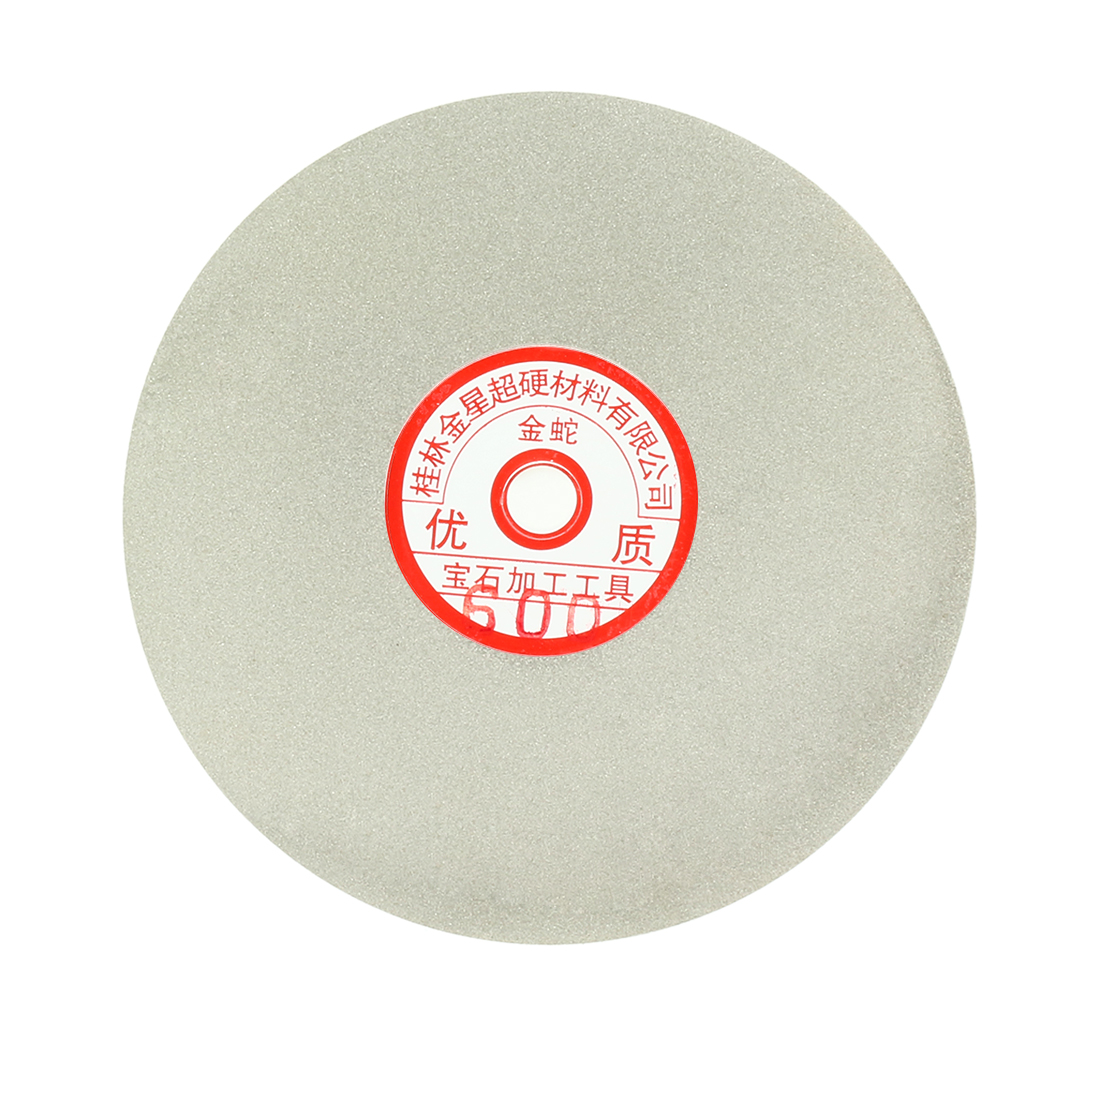 6-inch Grit 600 Diamond Coated Flat Lap Wheel Grinding Sanding Polishing Disc